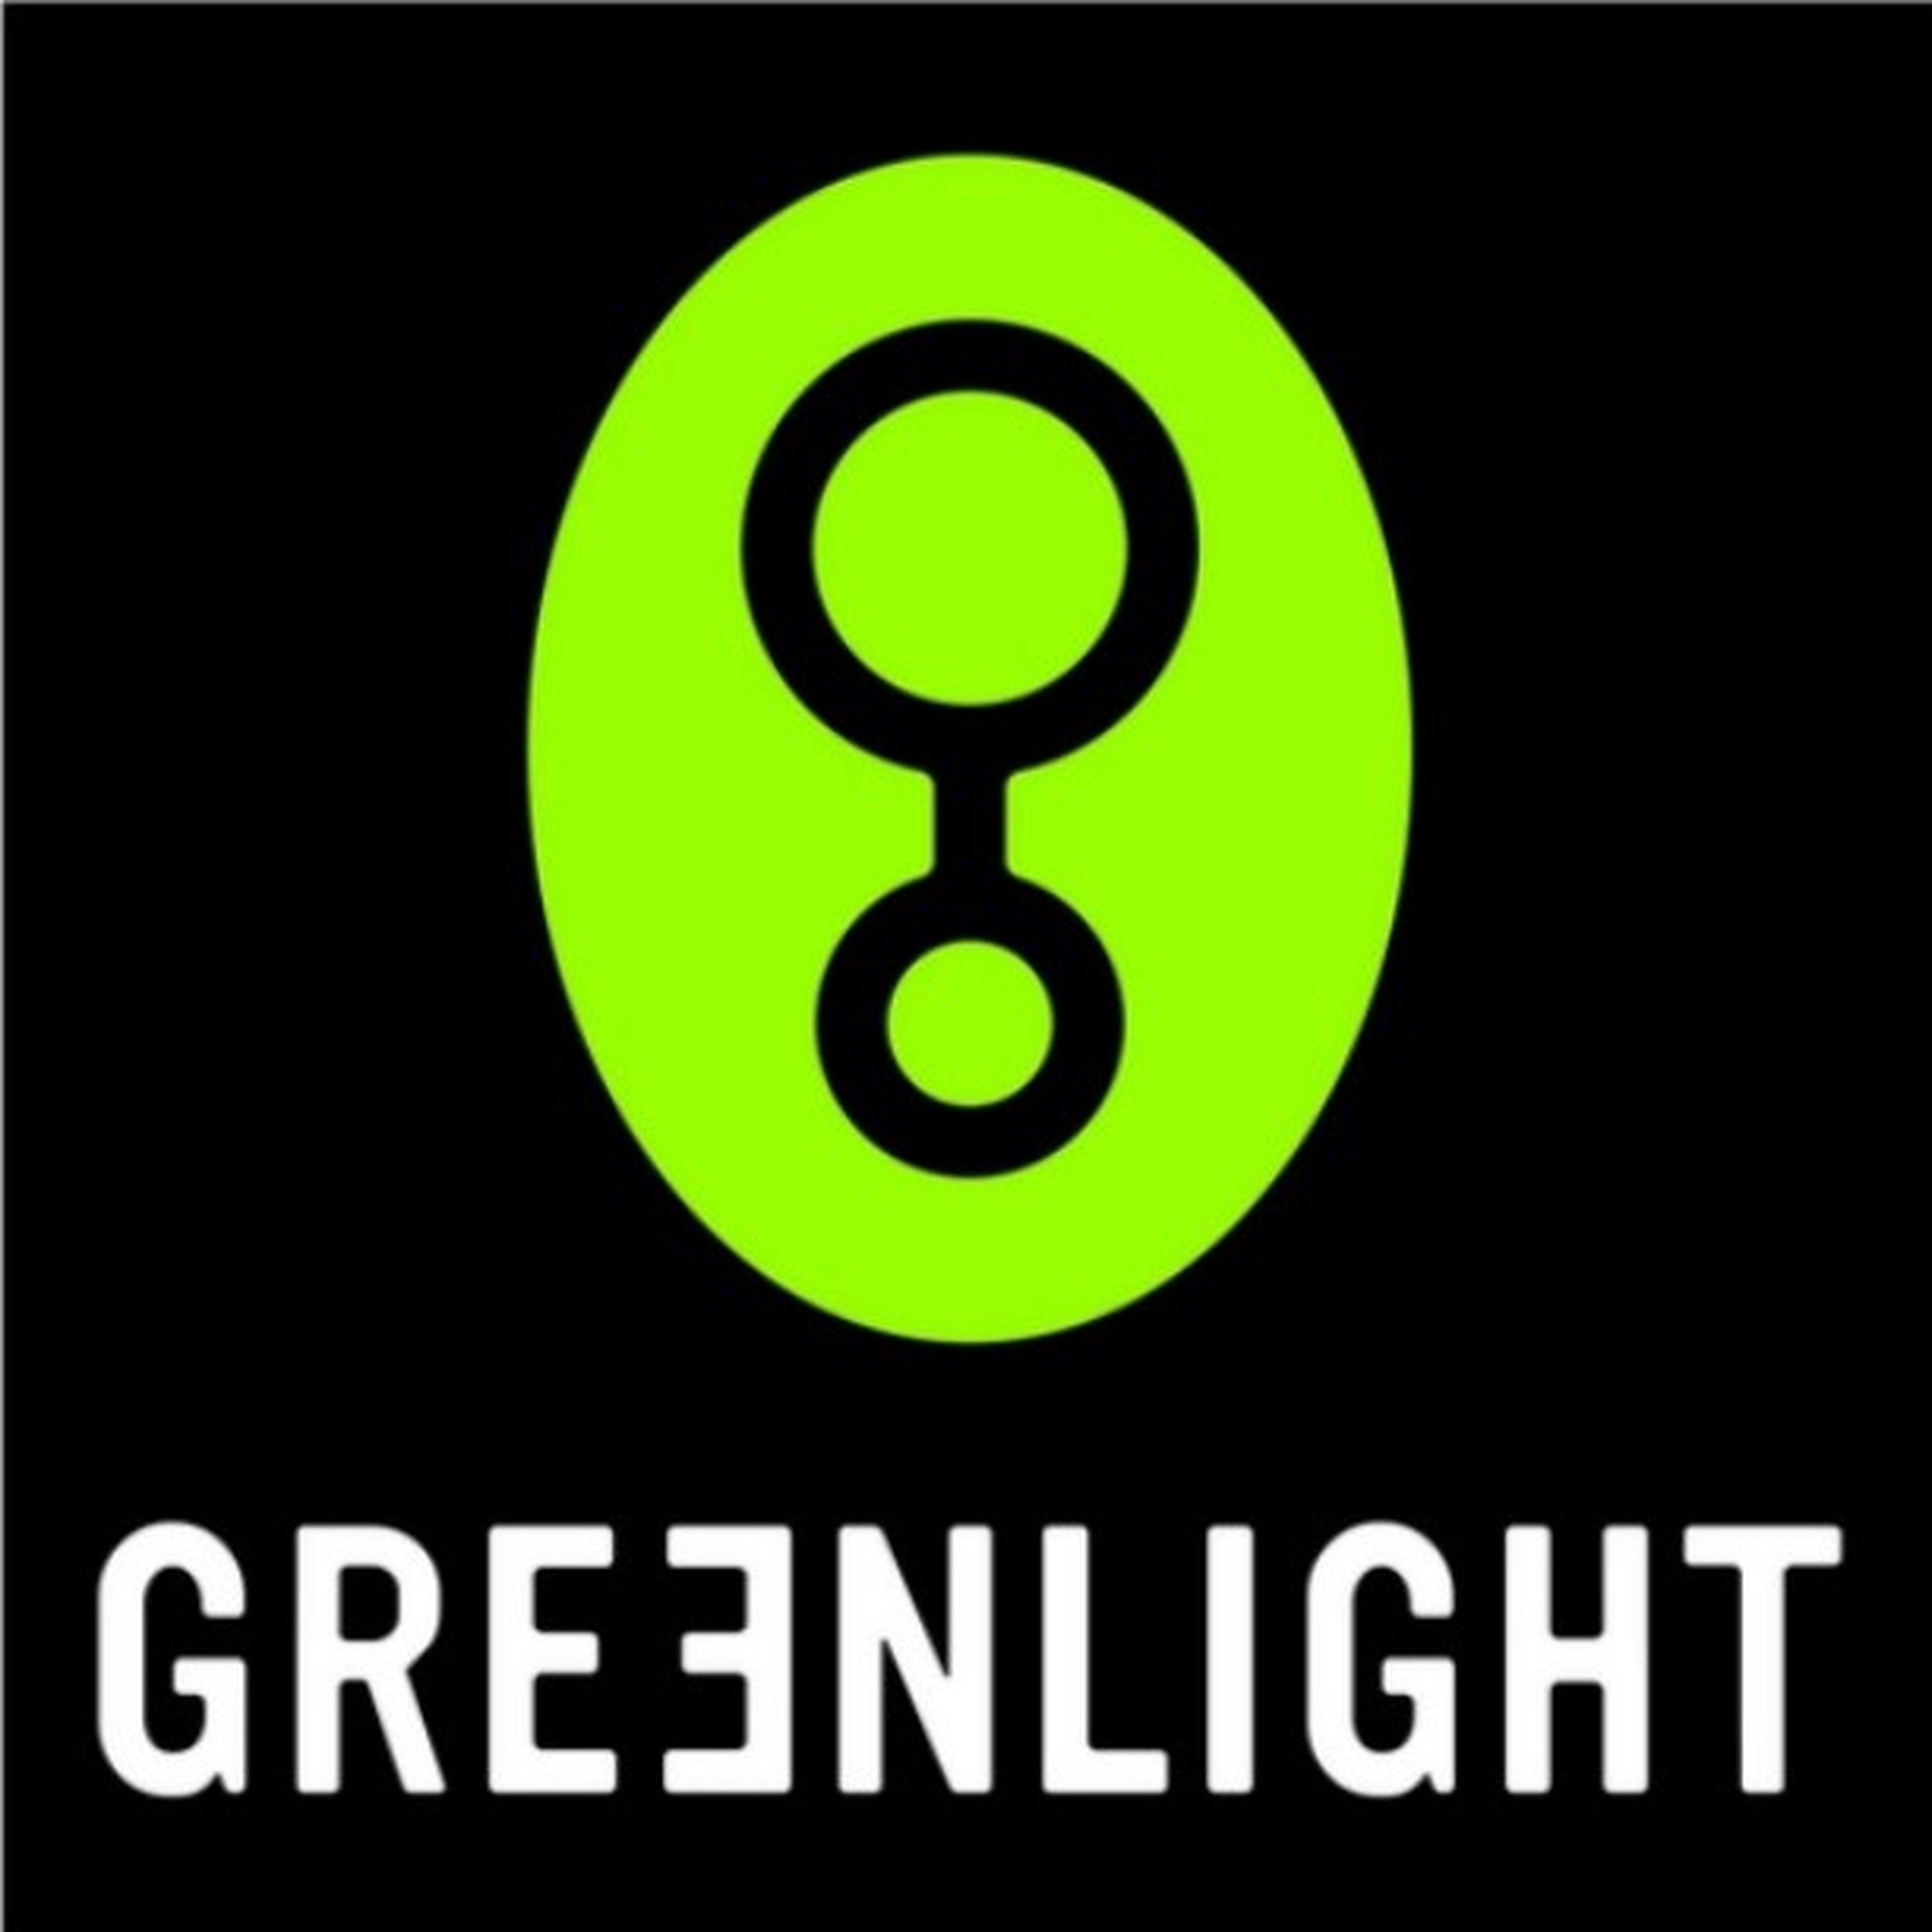 Greenliight Logo News_3SECOND